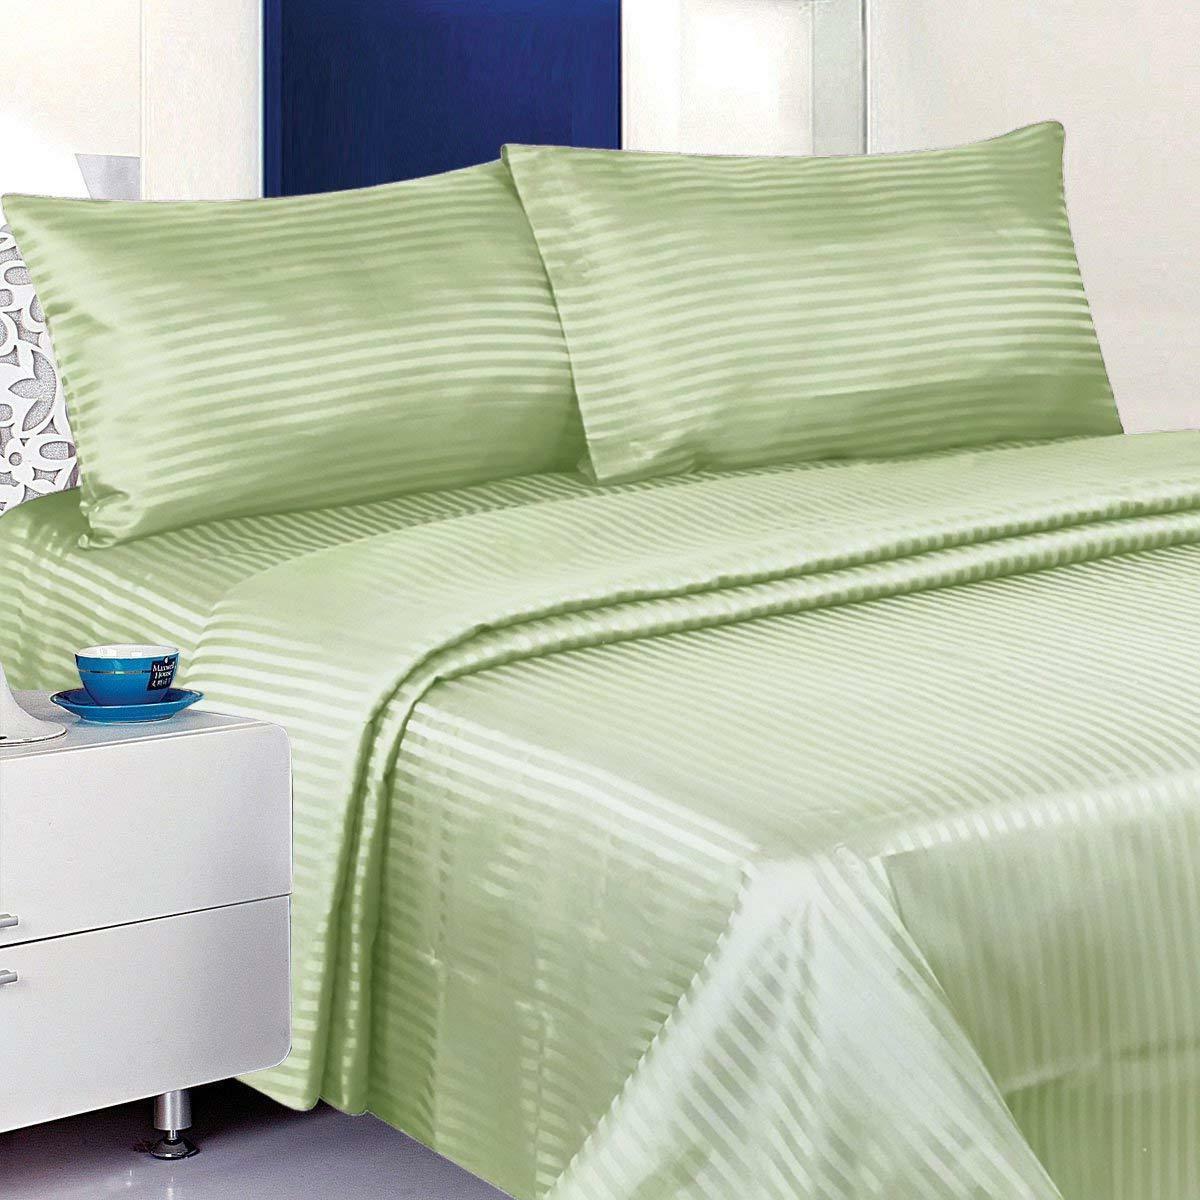 Bed Set 100%Cotton Sheets Size Pocket 4 Piece Sage